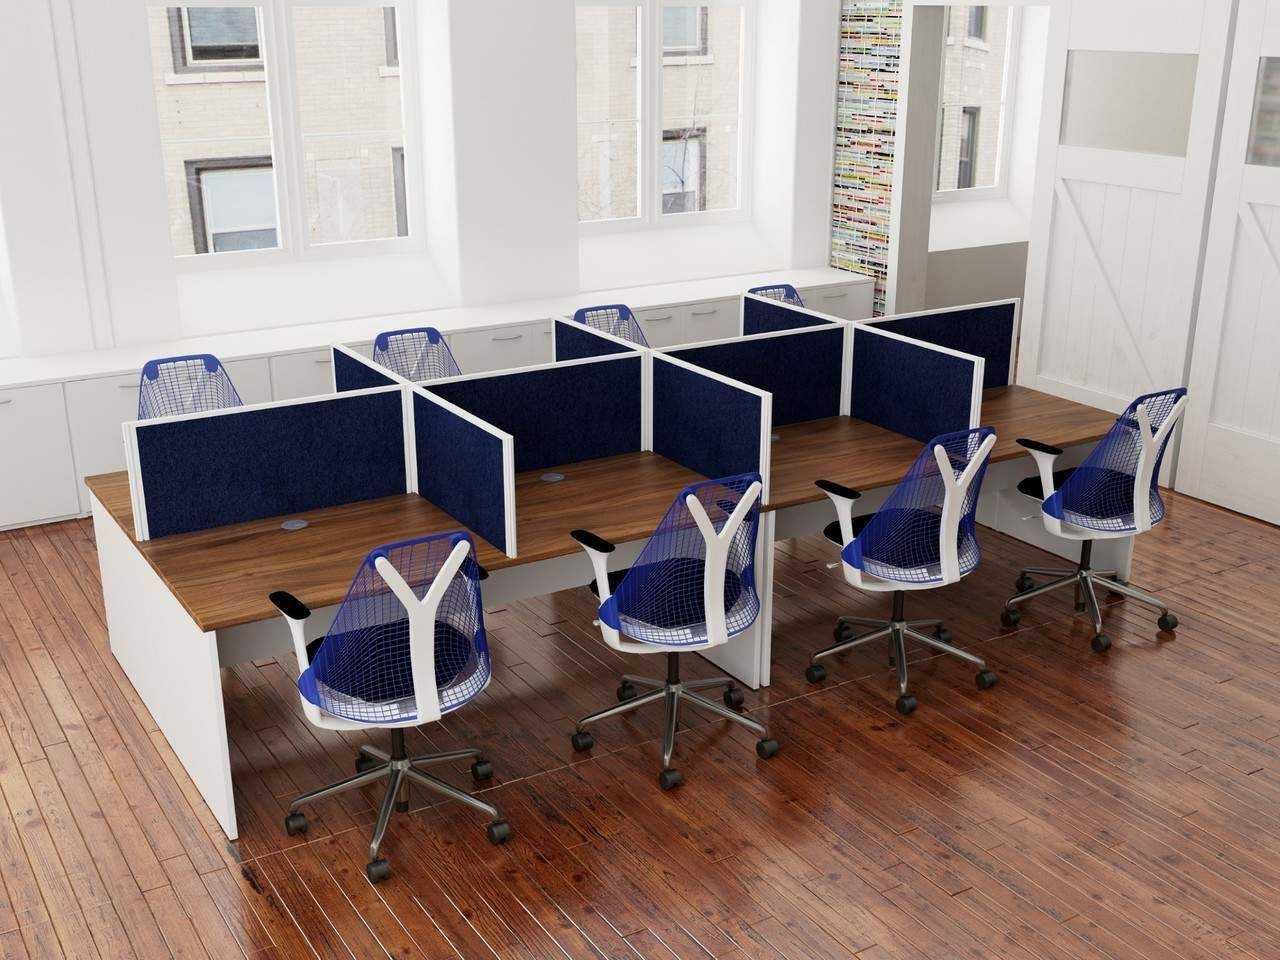 Tcs Rectangular Office Desk Call Center Workstations